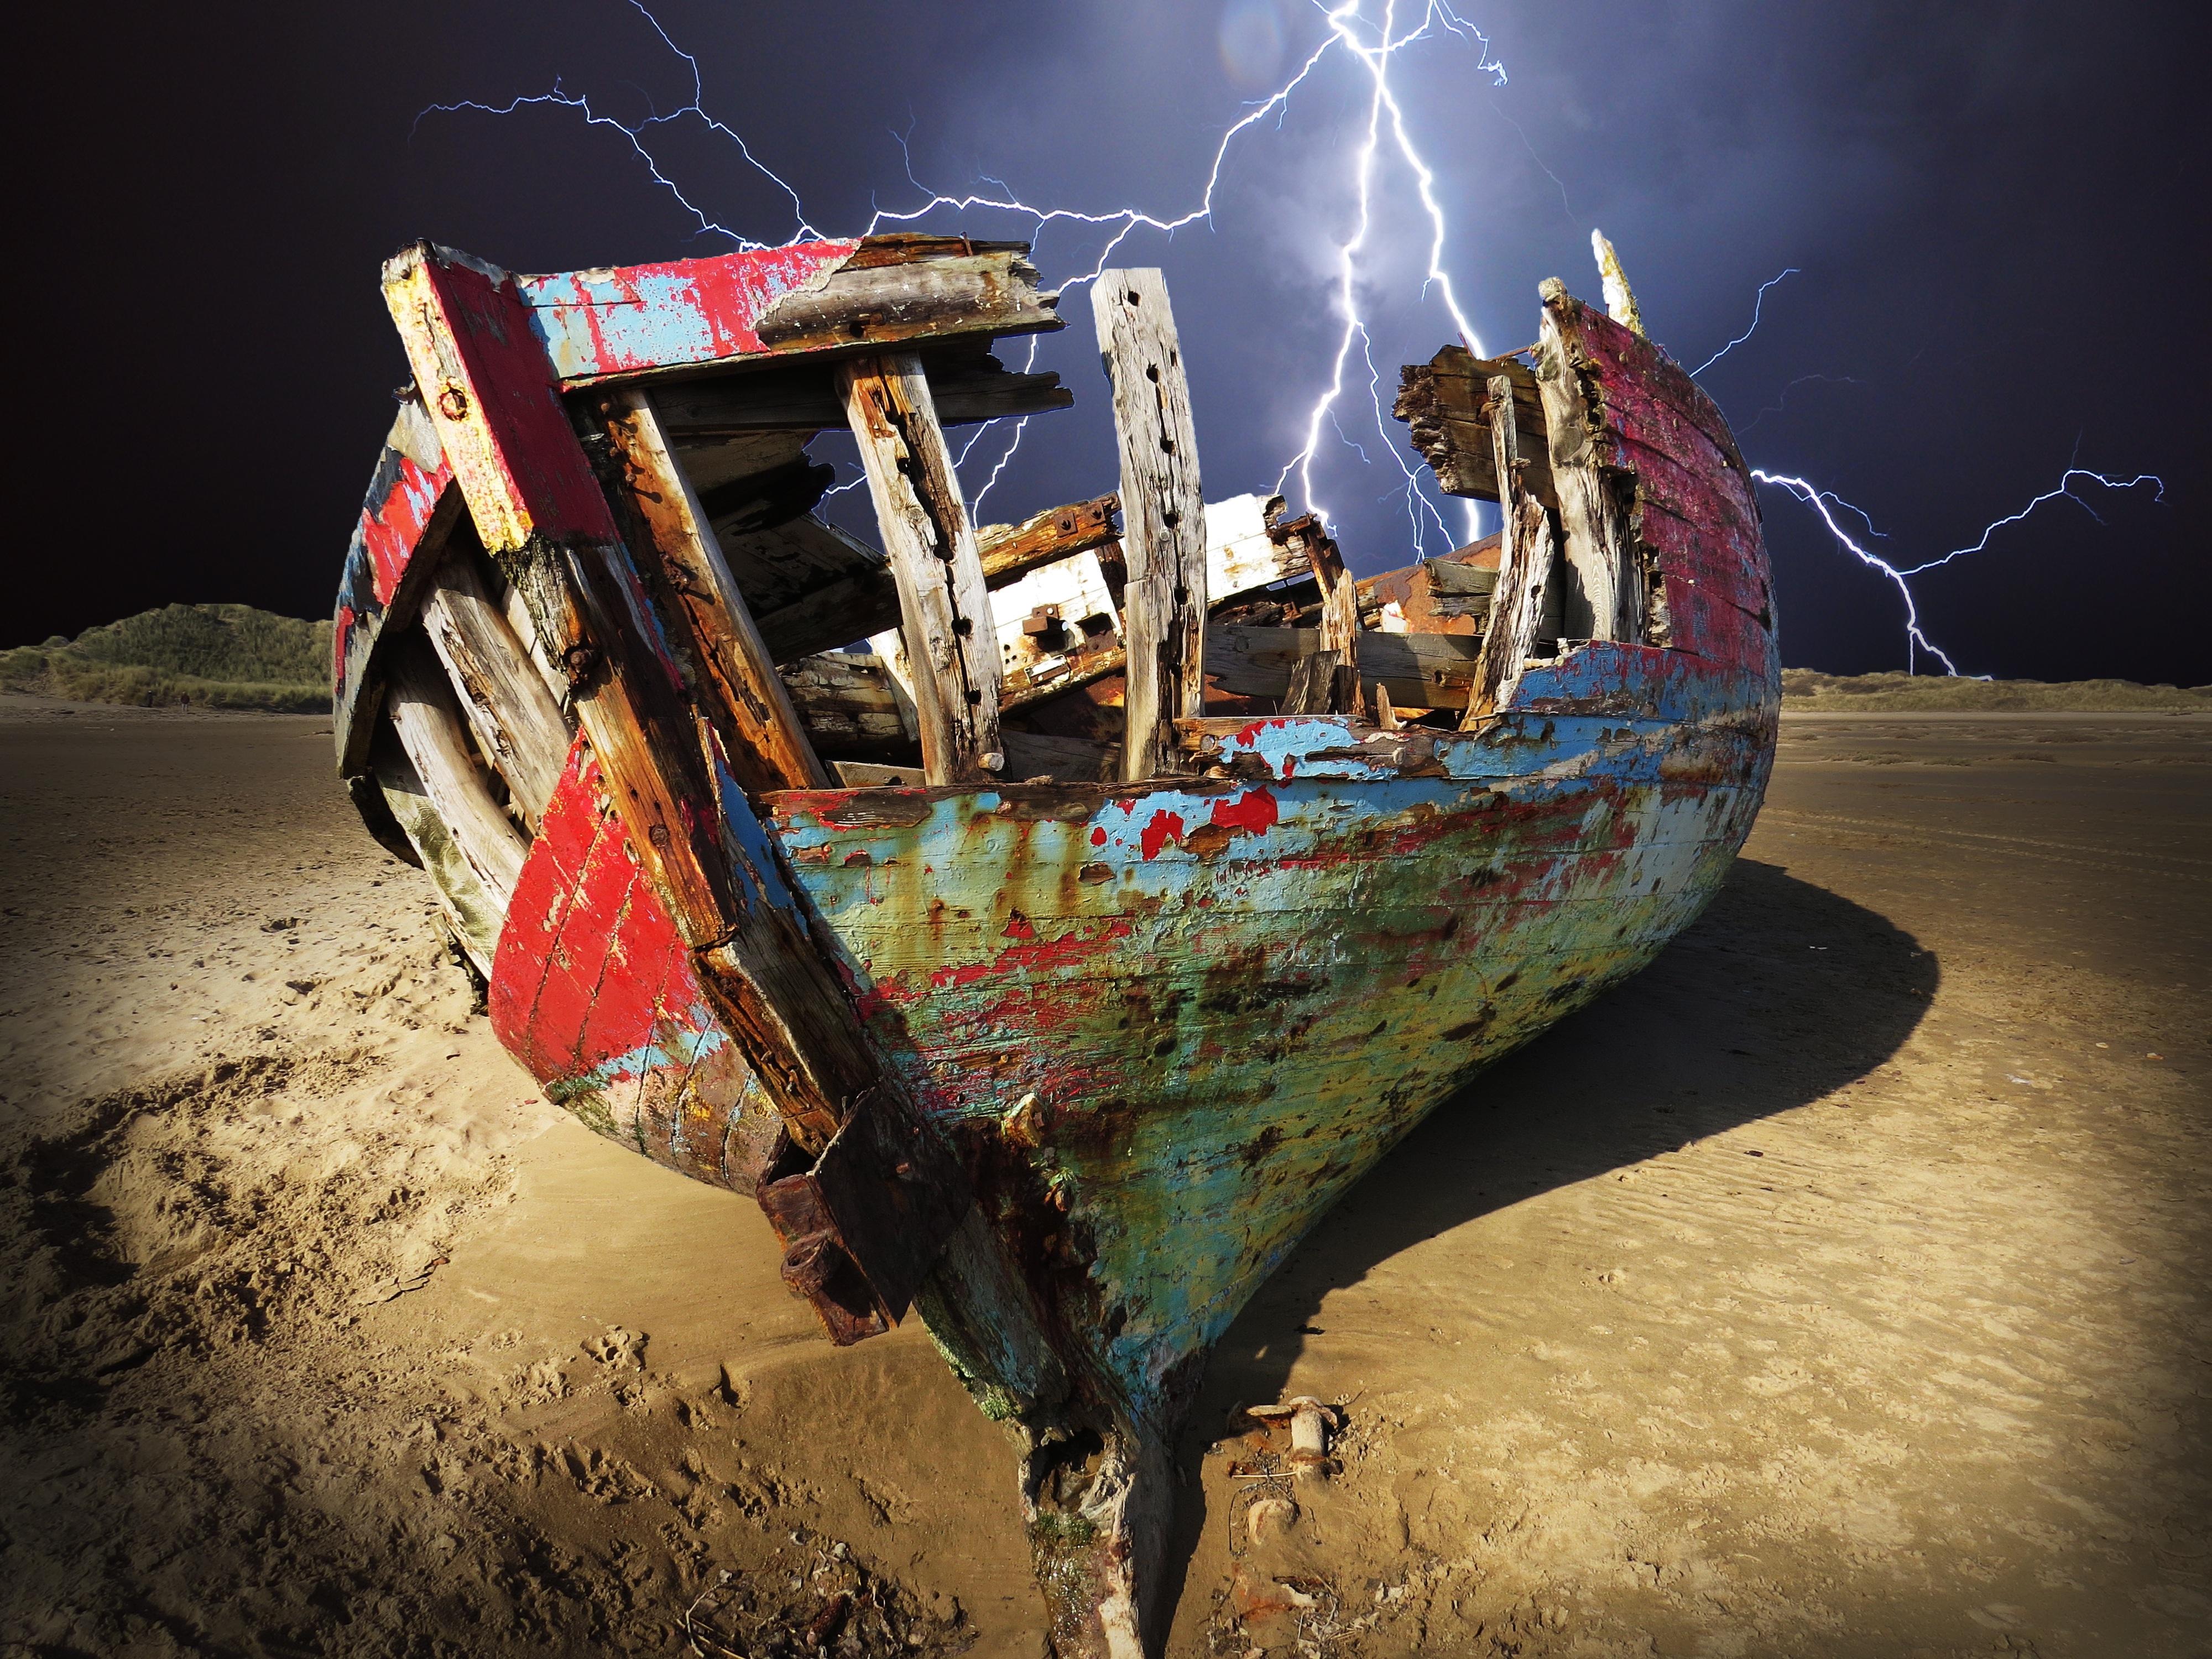 Kostenlose foto : Strand, Meer, Boot, Jahrgang, Fahrzeug, Farbe ...